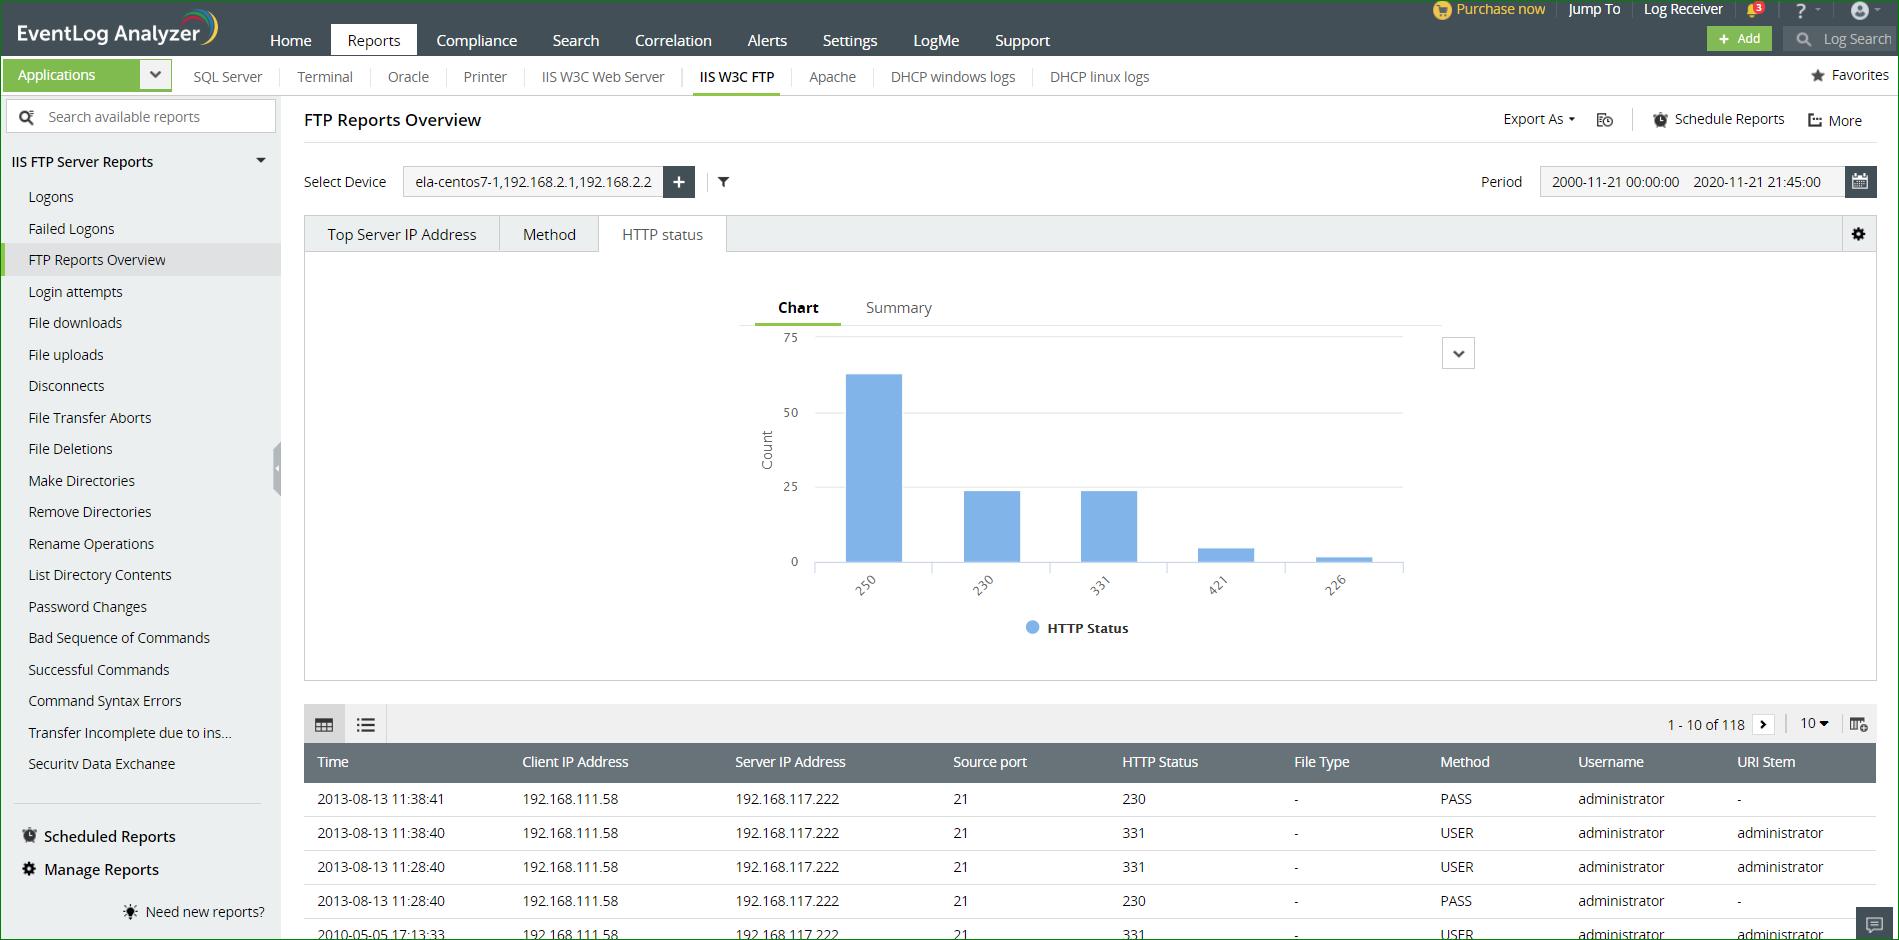 ManageEngine EventLog Analyzer